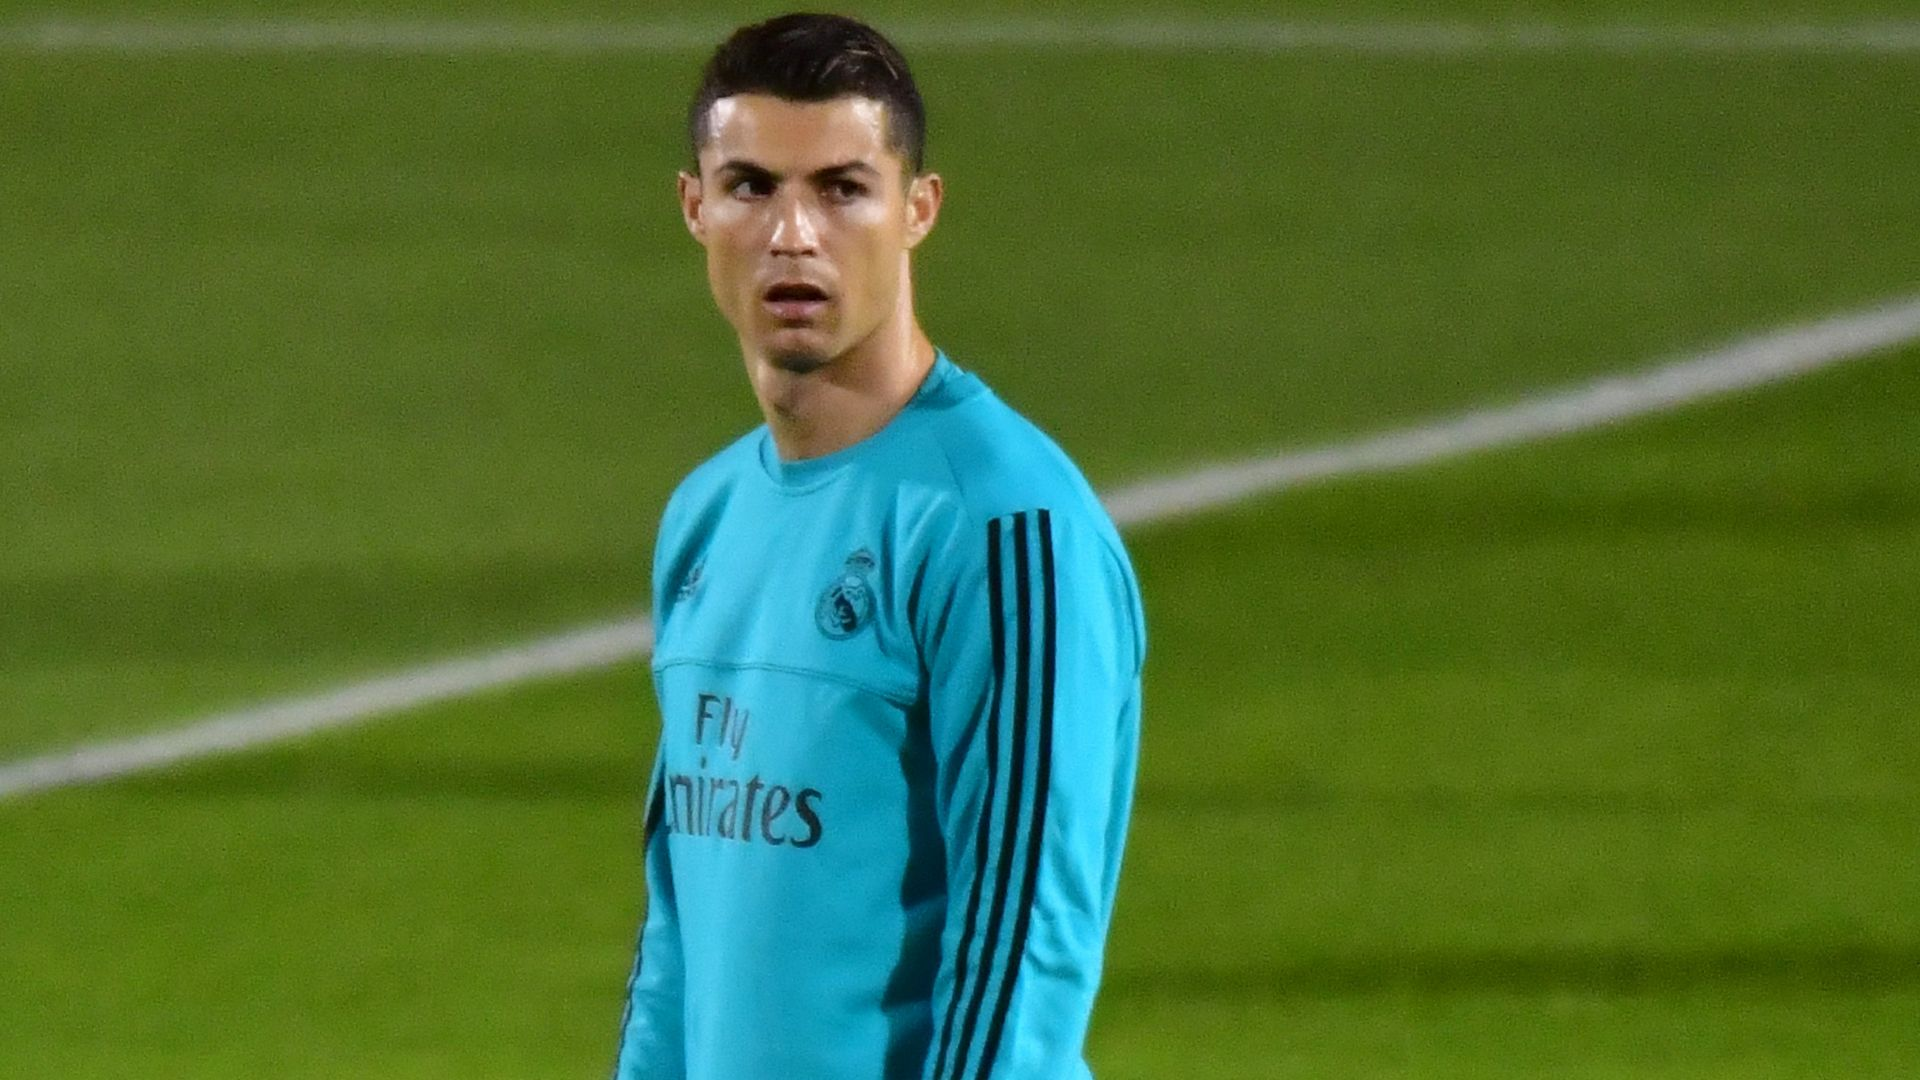 Cristiano Ronaldo misses final squad training ahead of Clasico